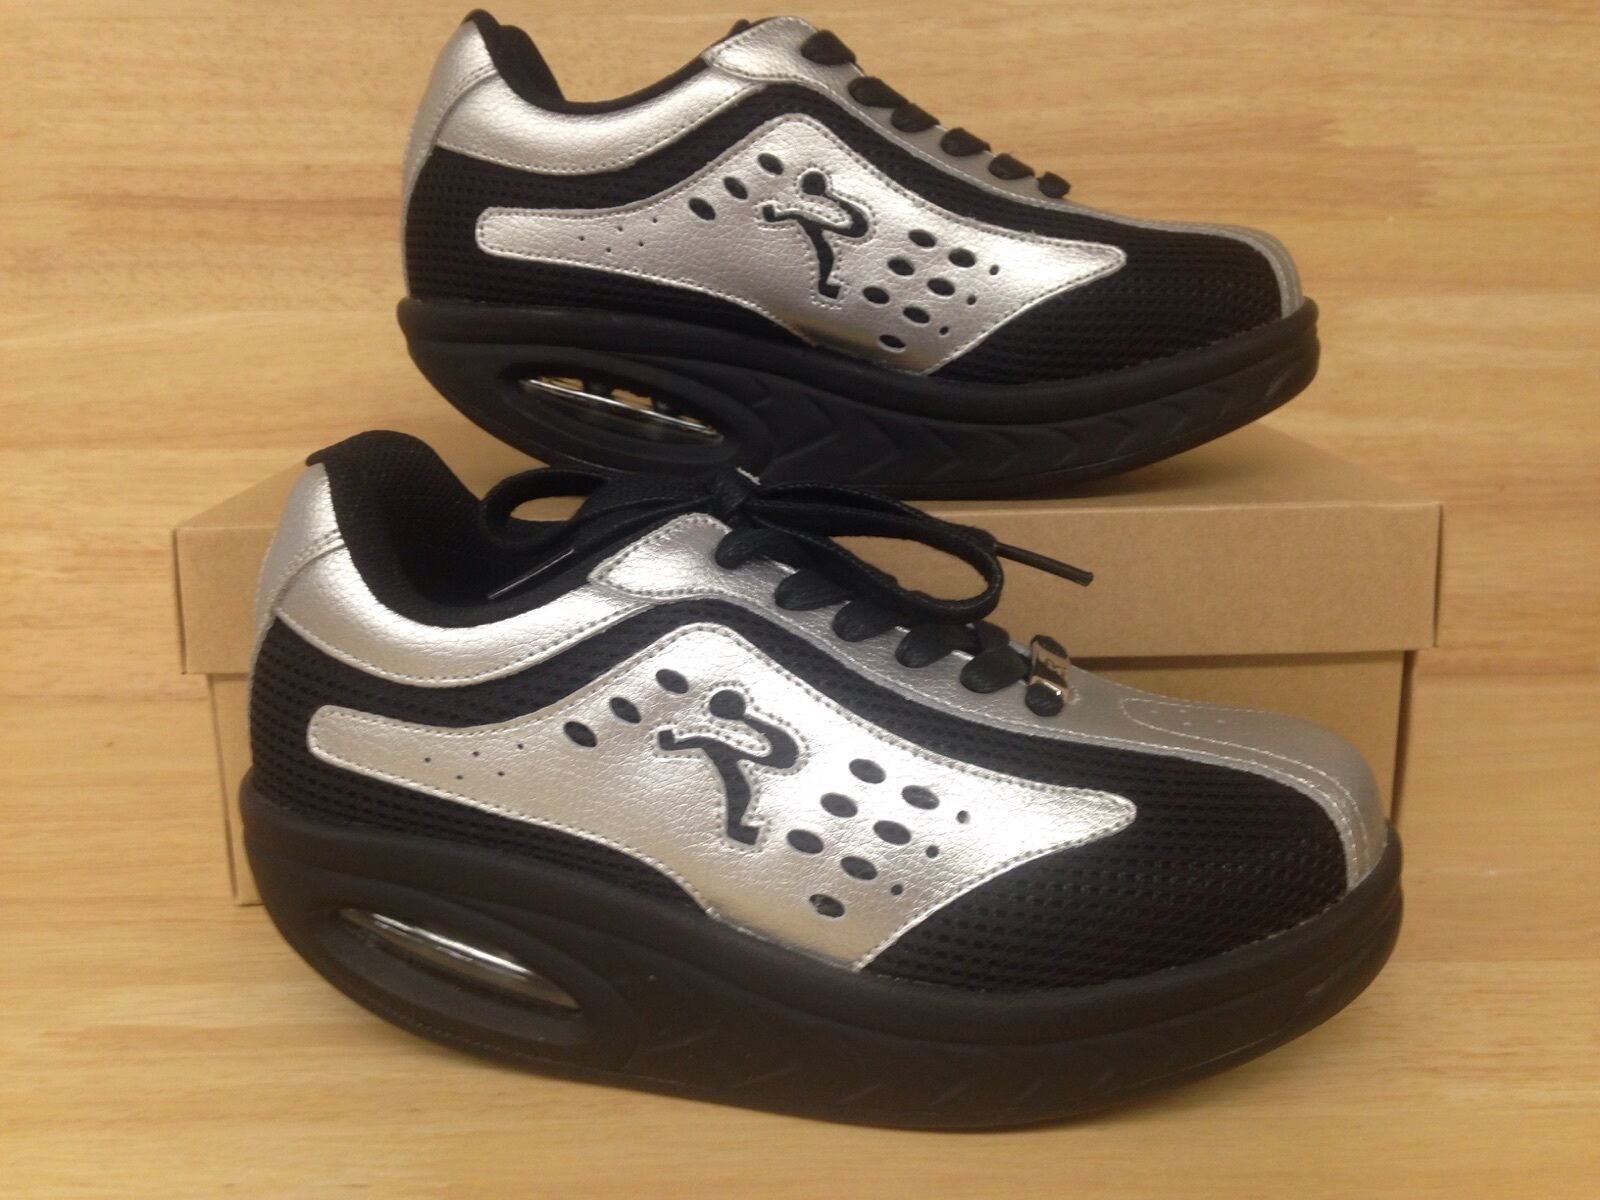 Ryn Nazca Black & Silver US Size 6.5 (Kor 235, Eu 37.0, )